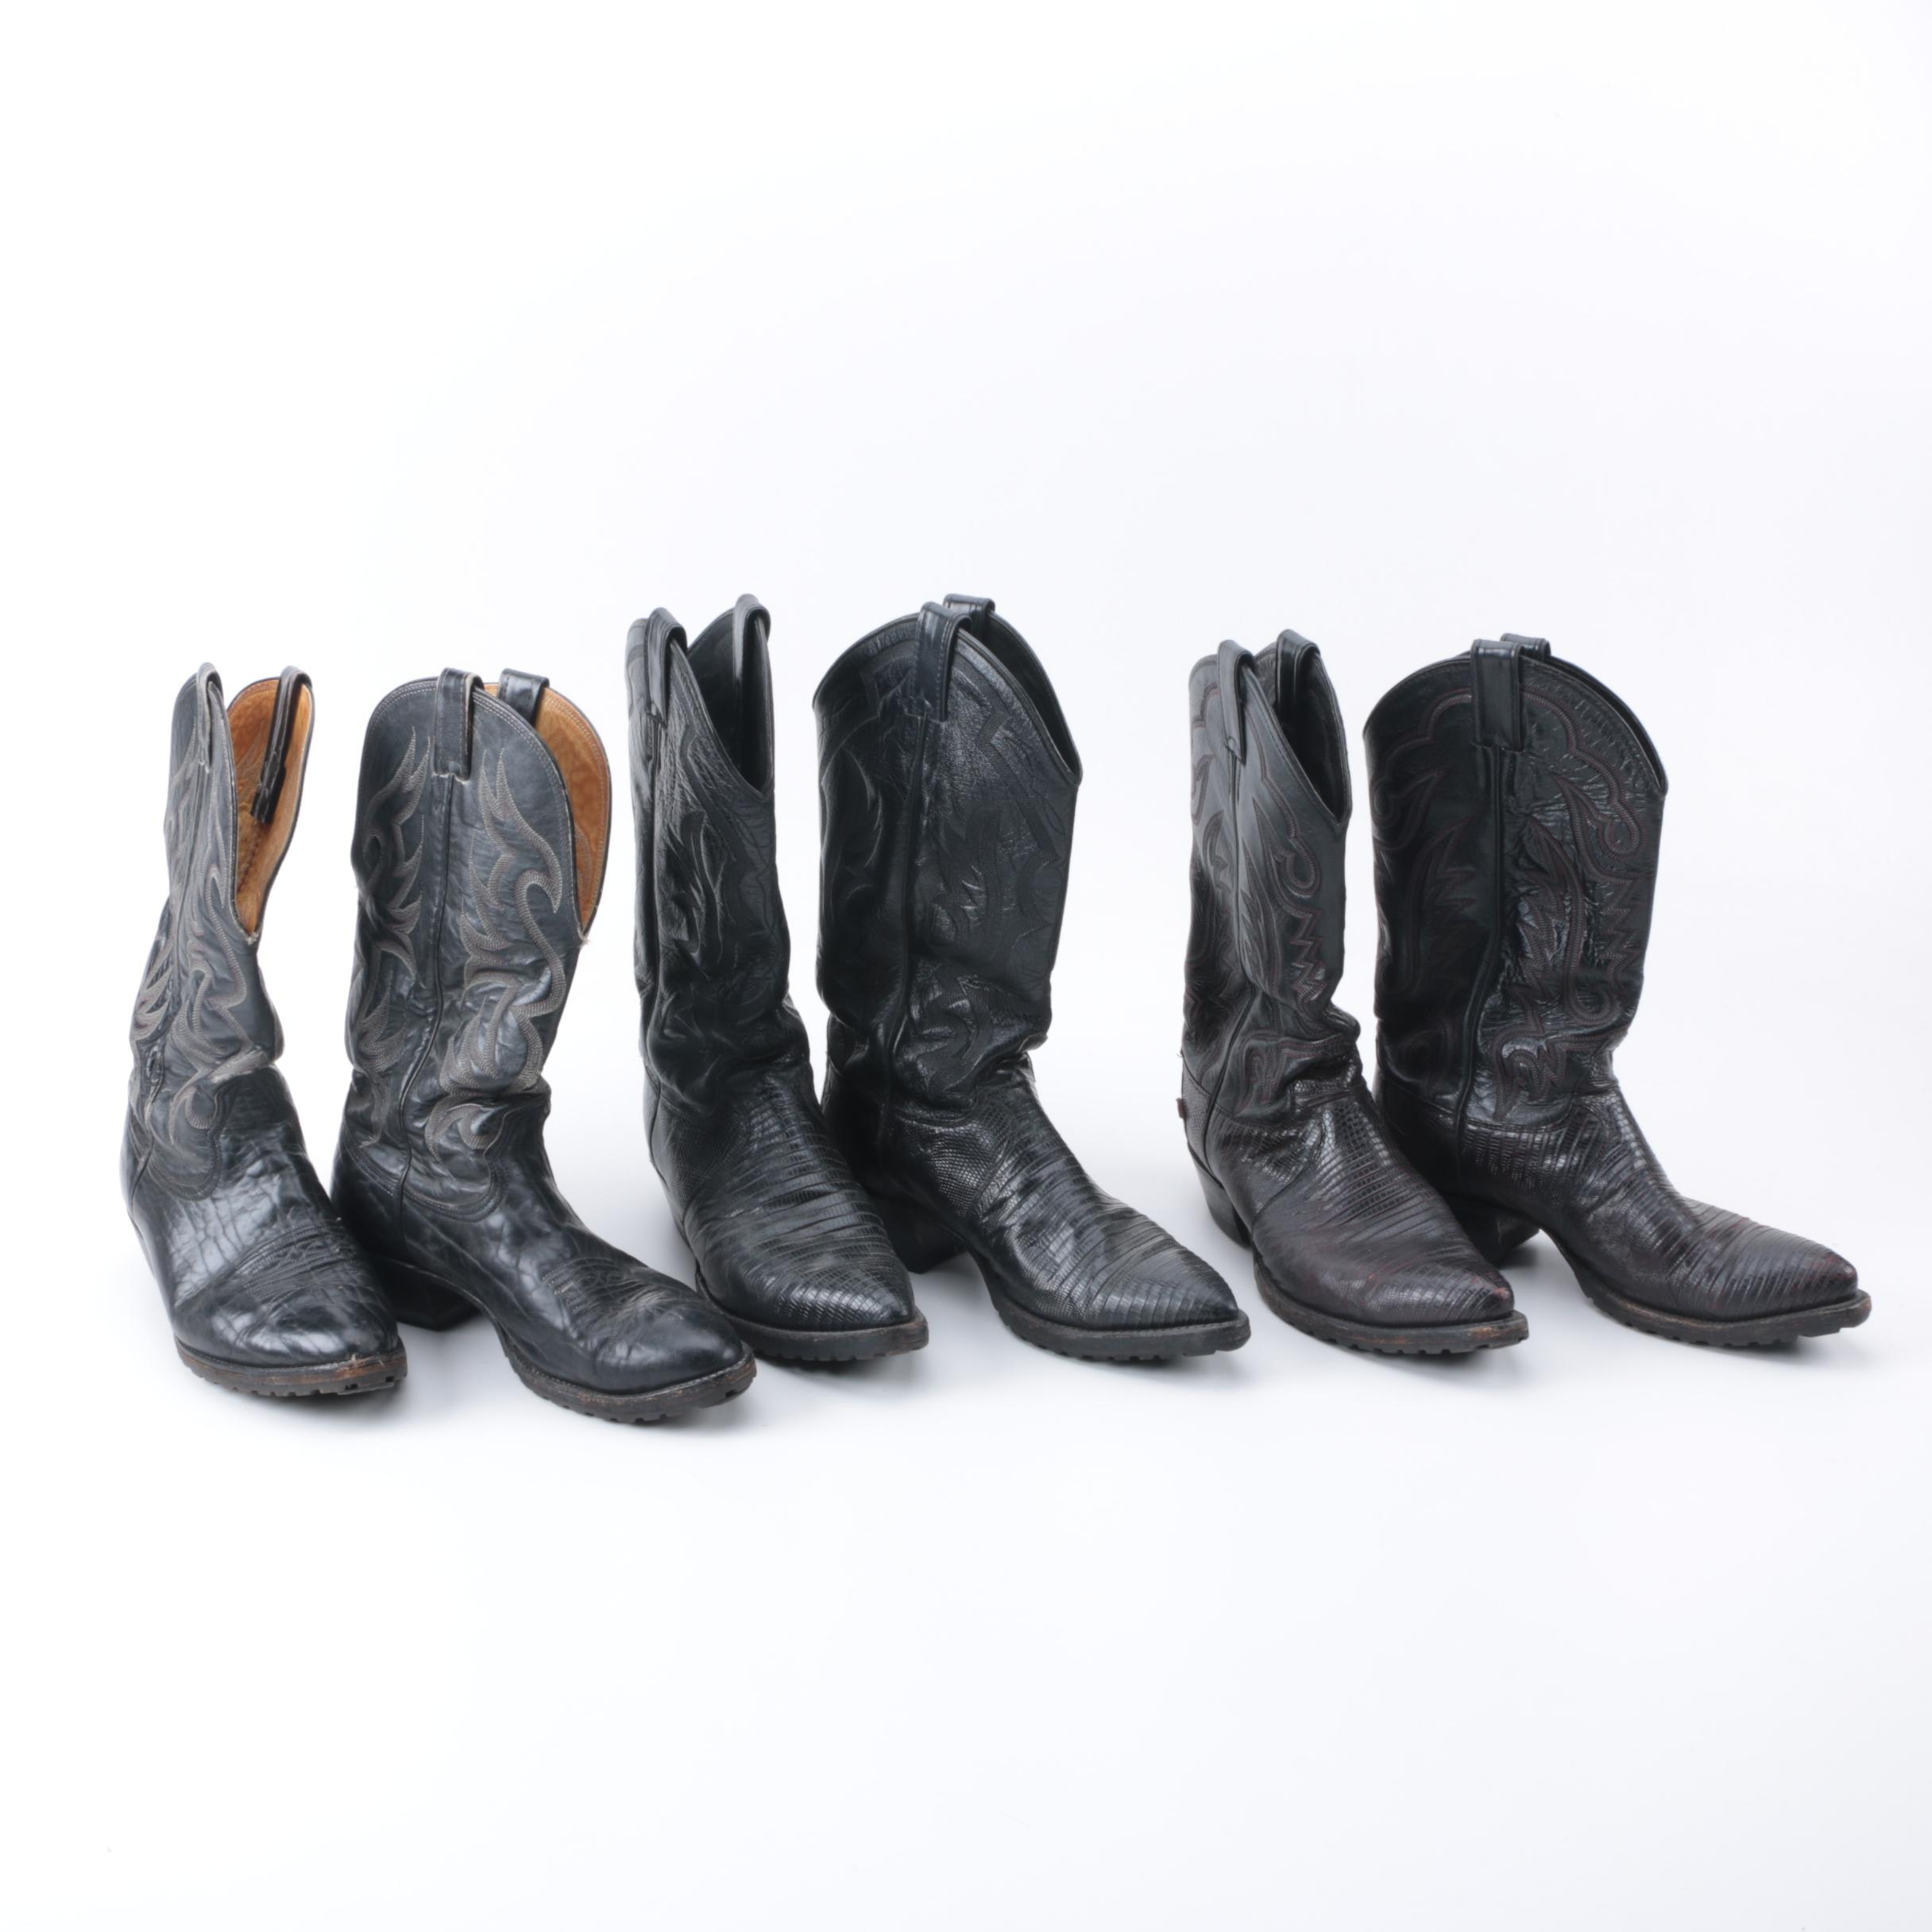 Cowboy Boot Assortment